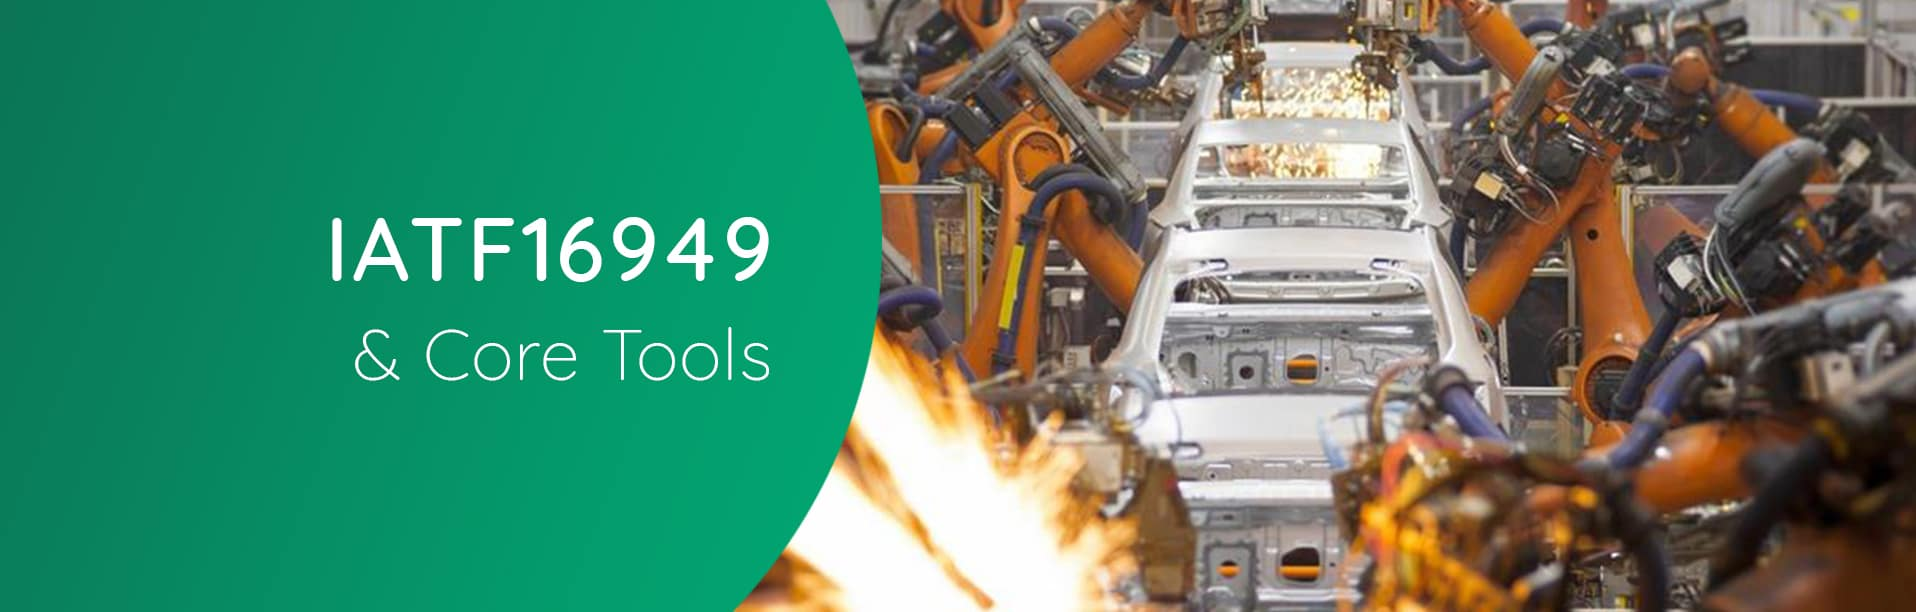 iatf 16949 core tools